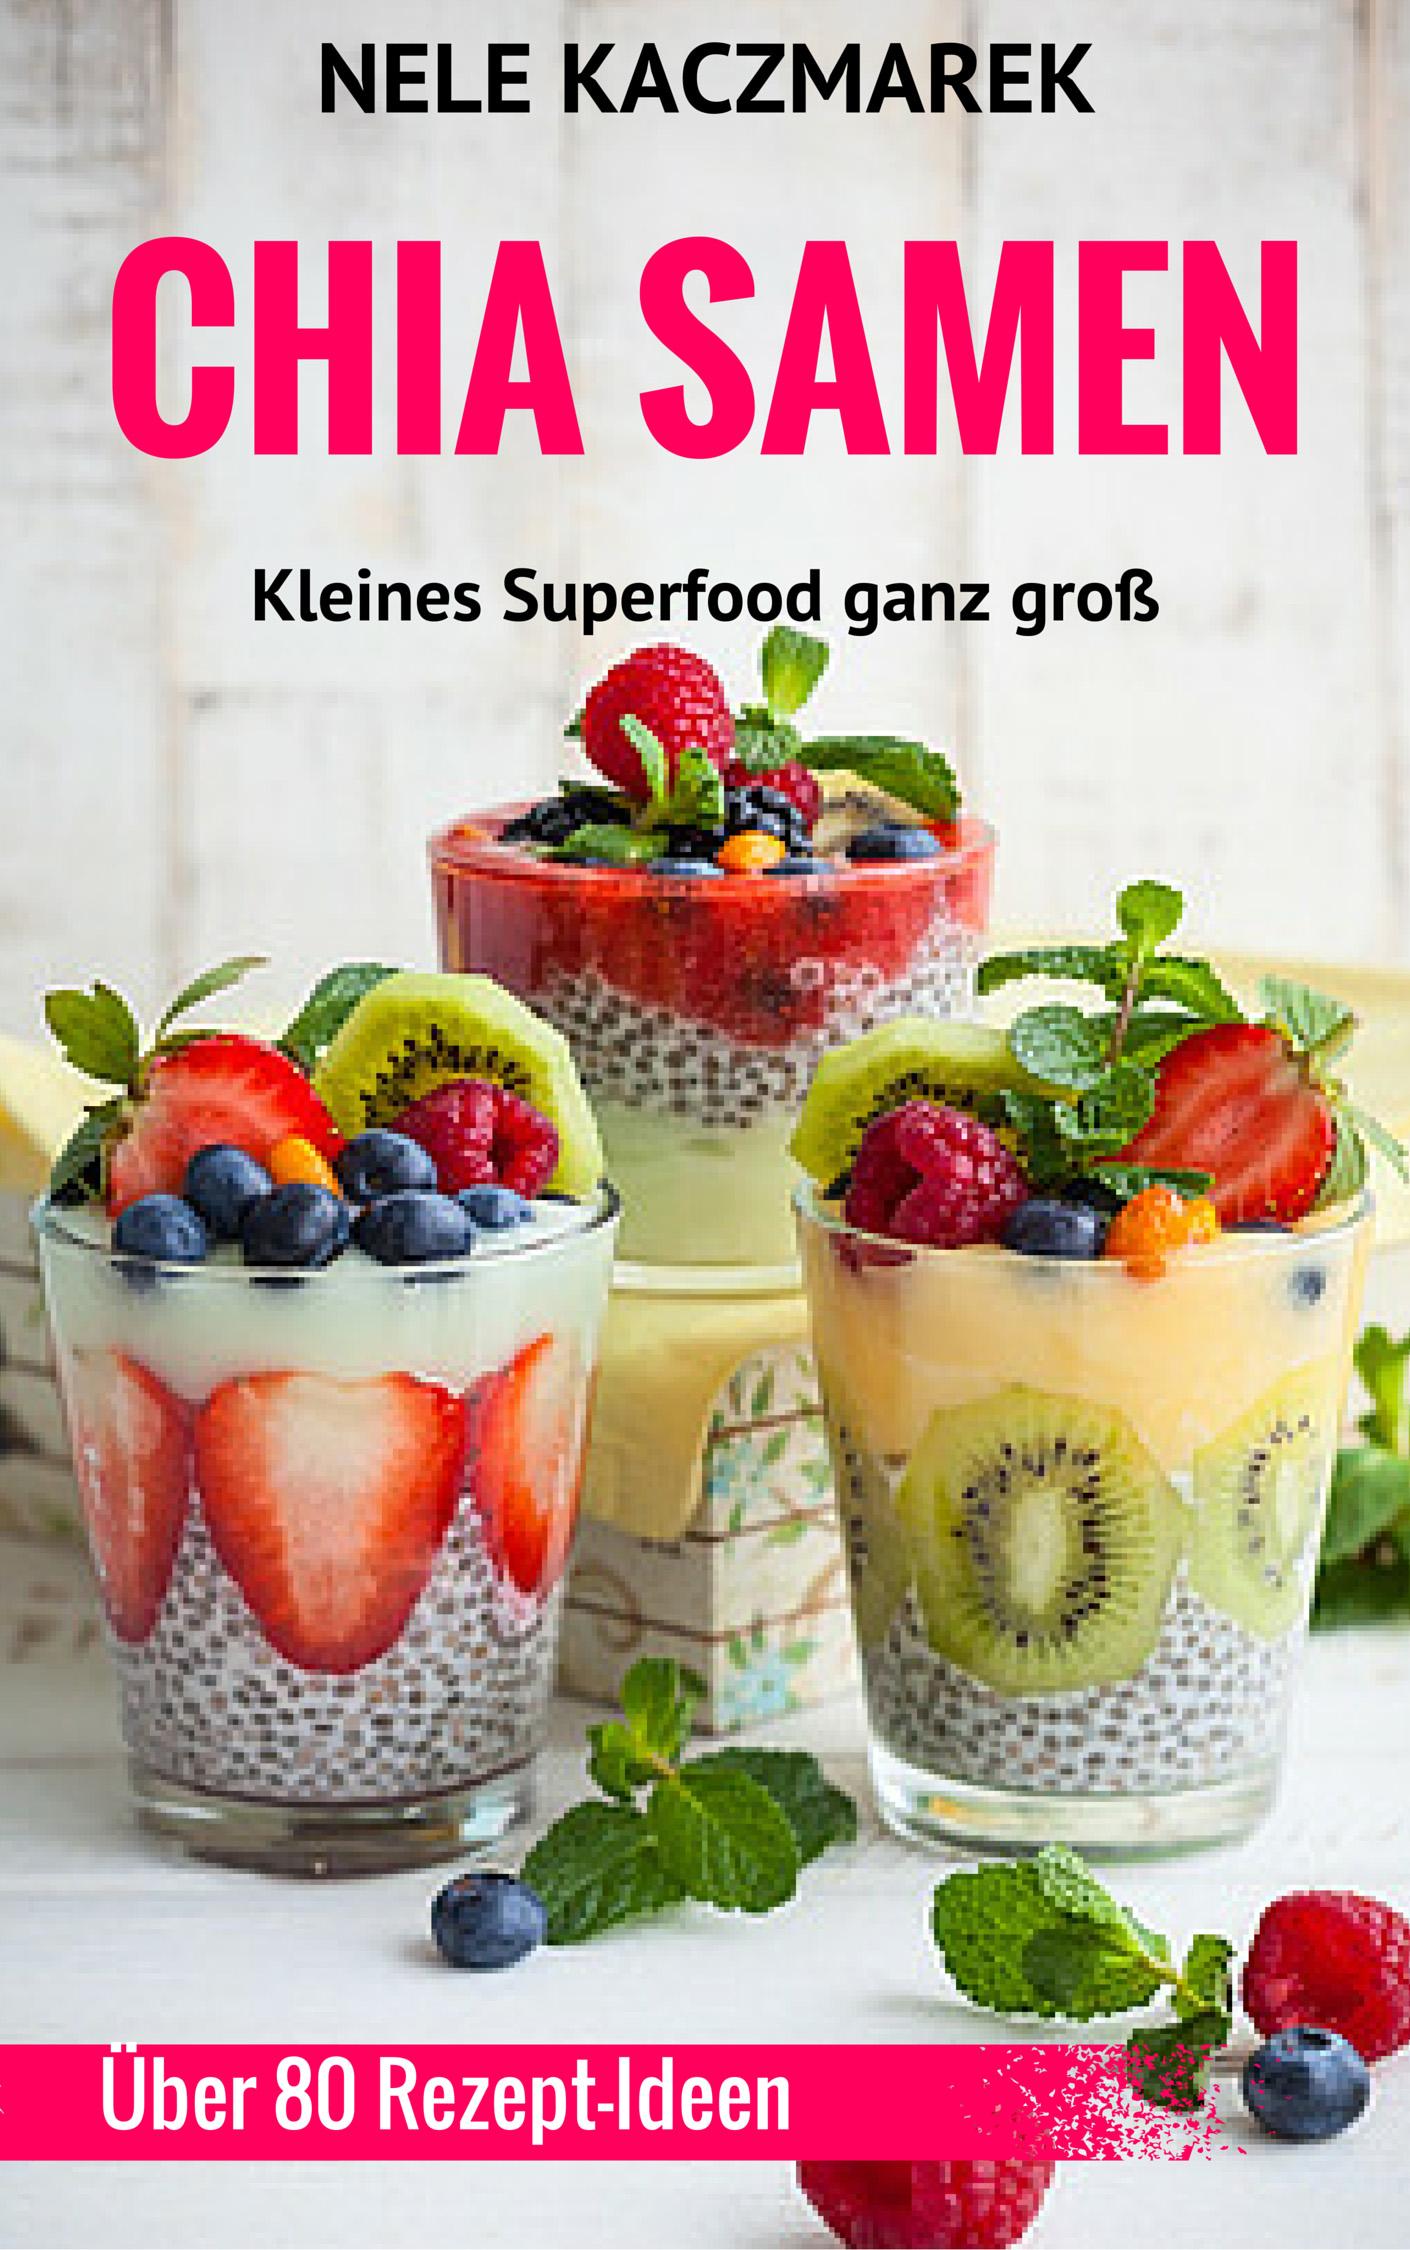 Nele Kaczmarek – Chia Samen – Kleines Superfood ganz groß